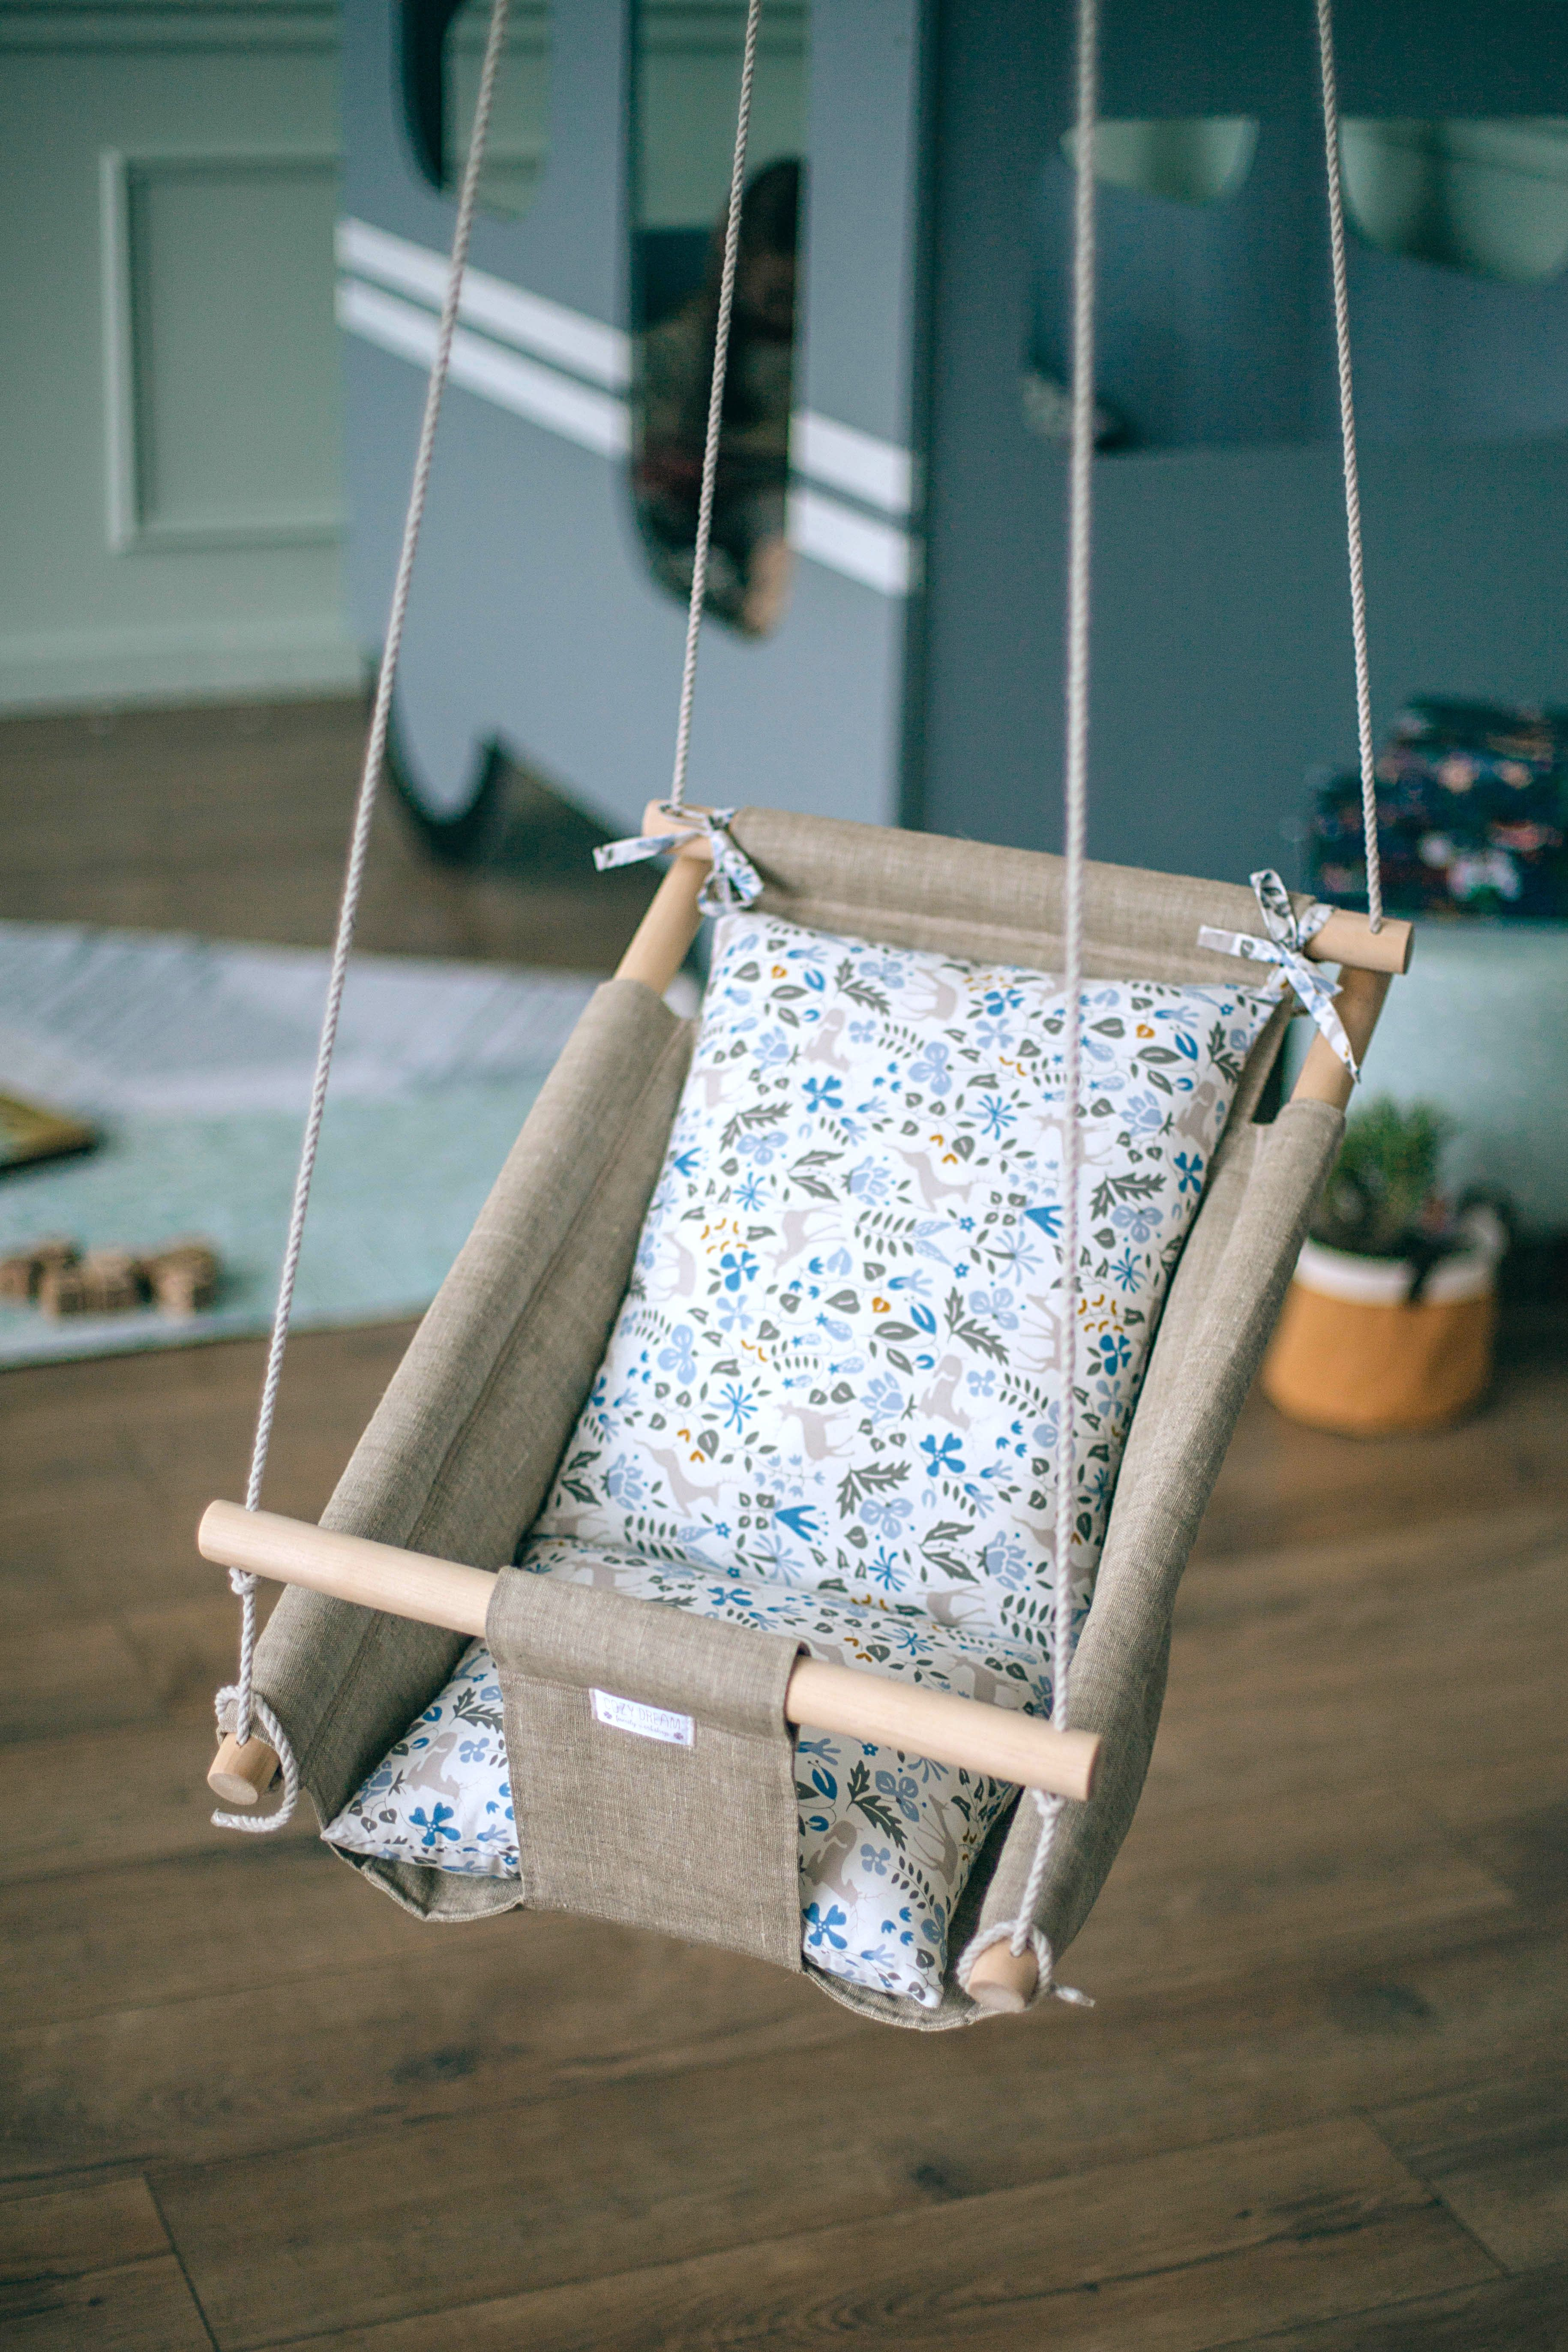 Stylish swing. Organic baby lounger. Linen bedding